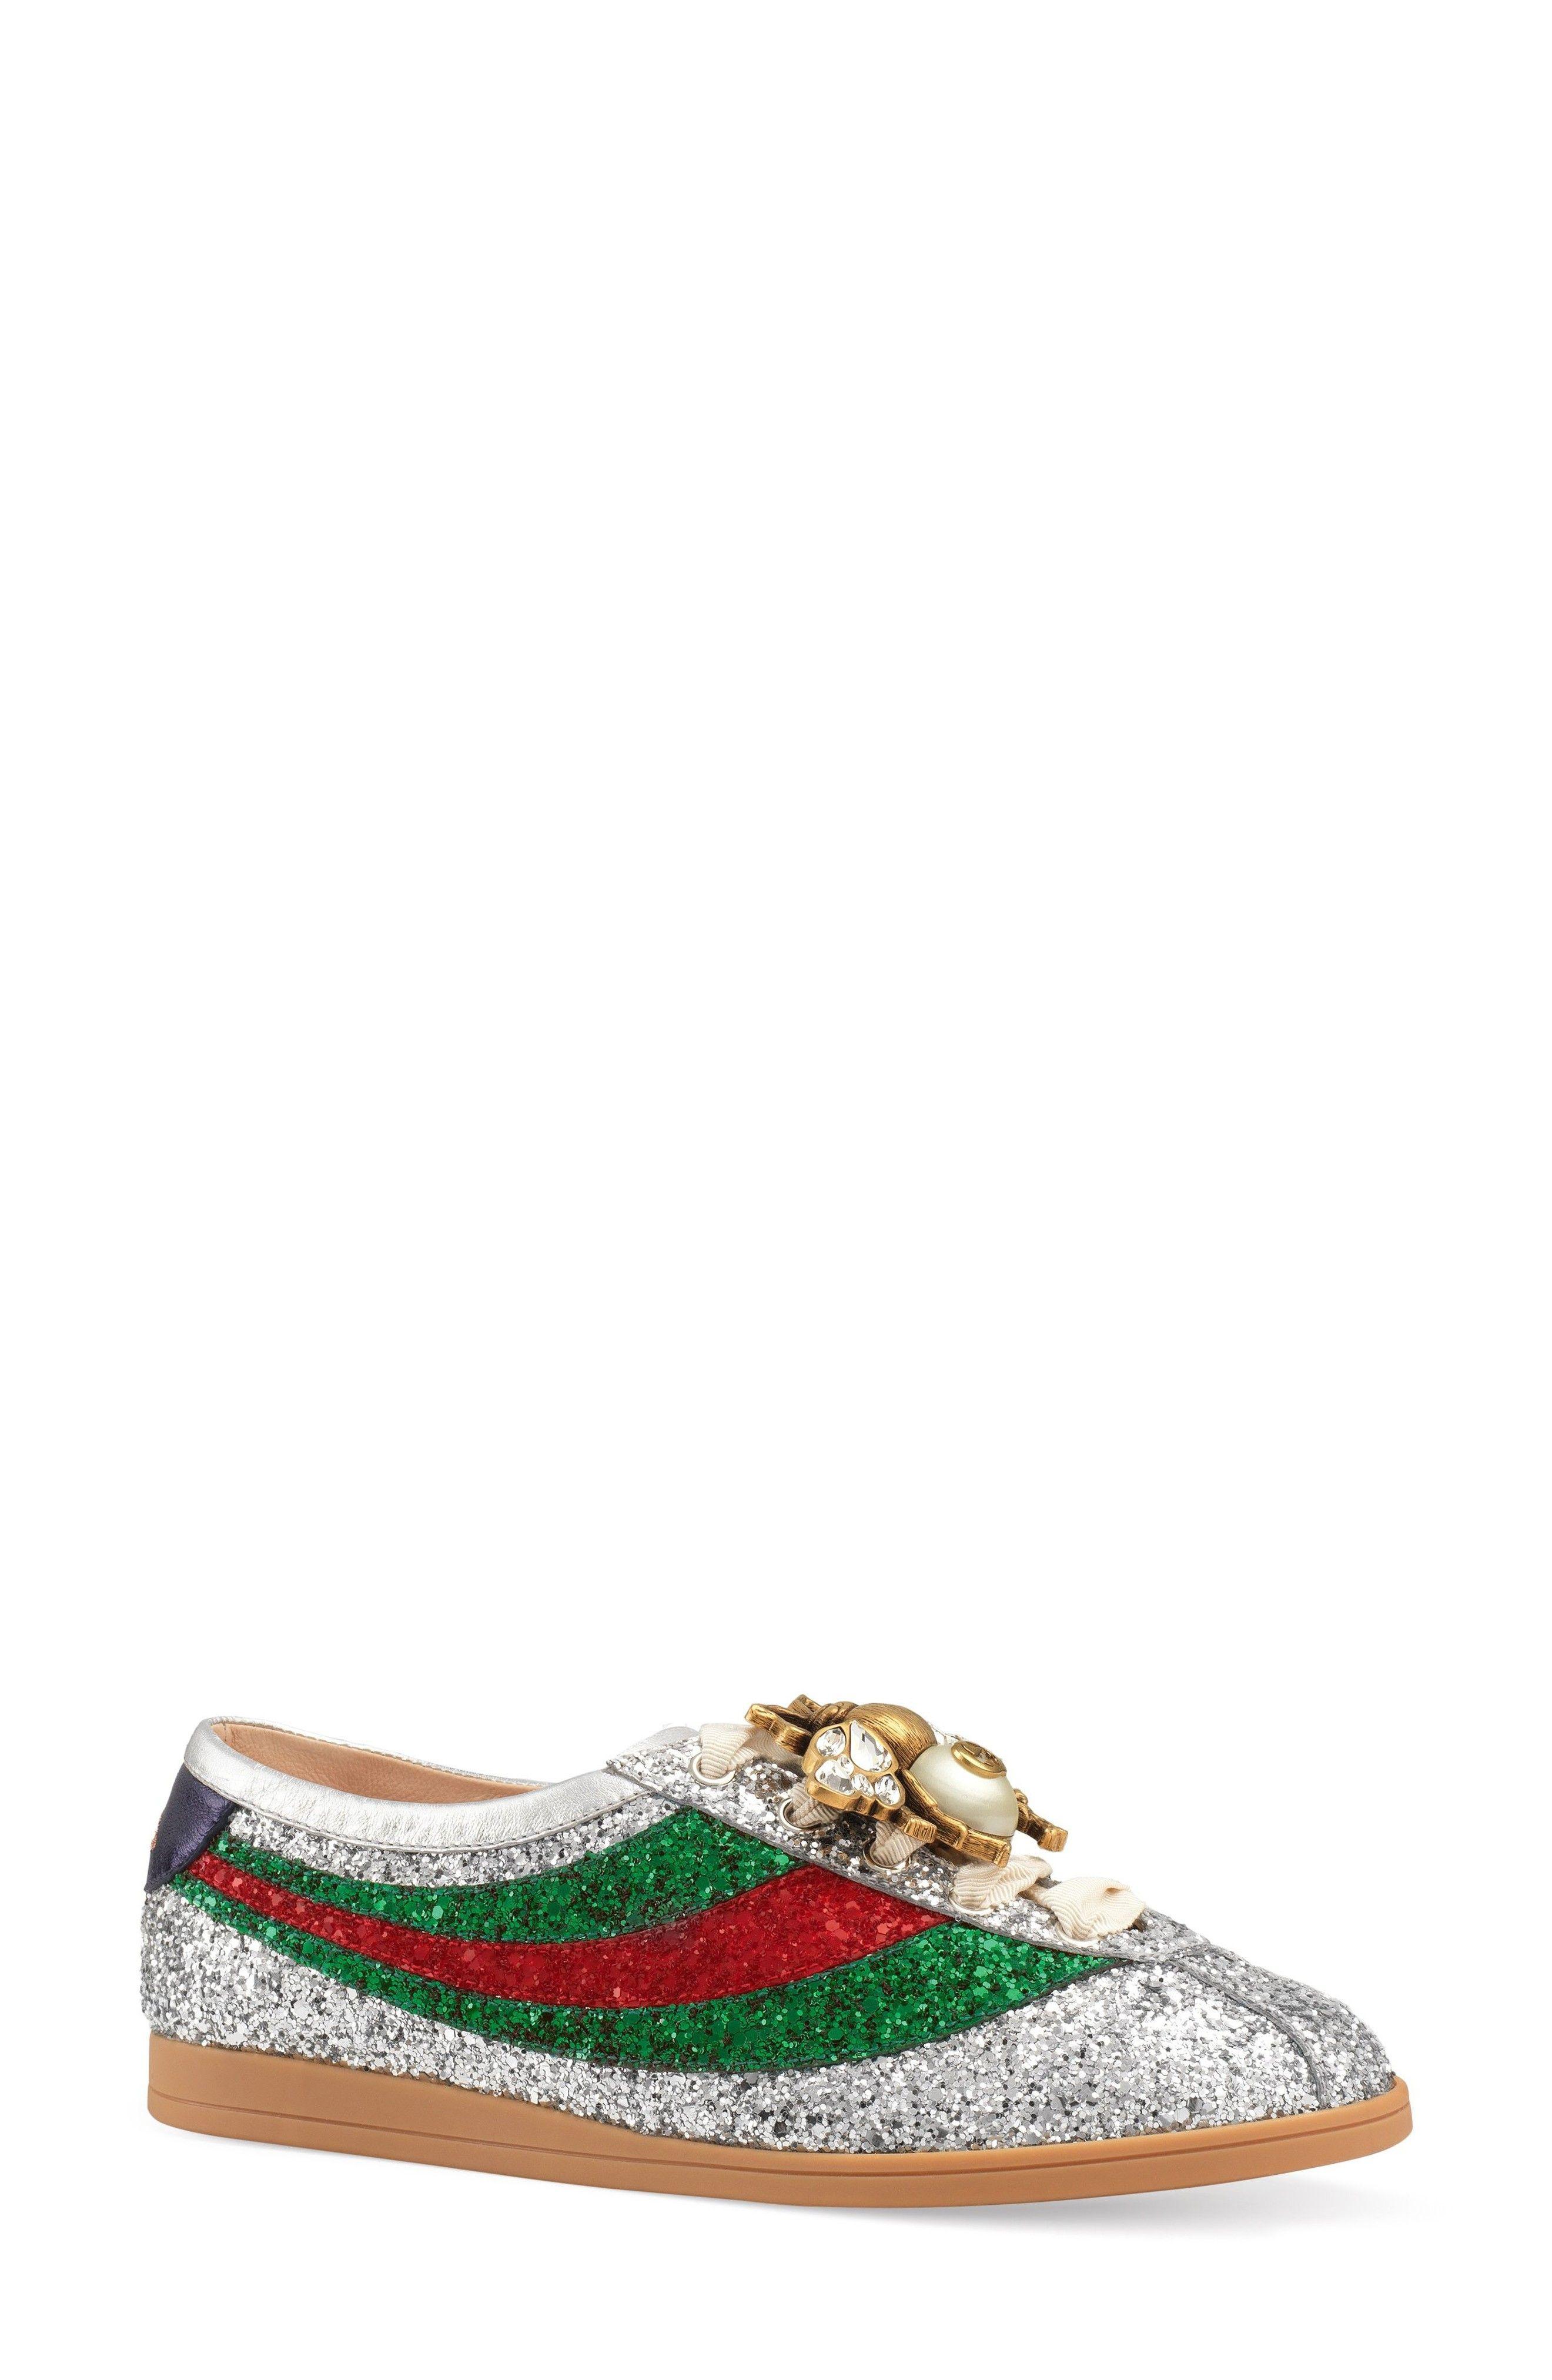 Buy GUCCI Falacer Glitter Sneaker online. New GUCCI Shoes.   1100  SKU  KRHN95926ROWR33764 e8e610729